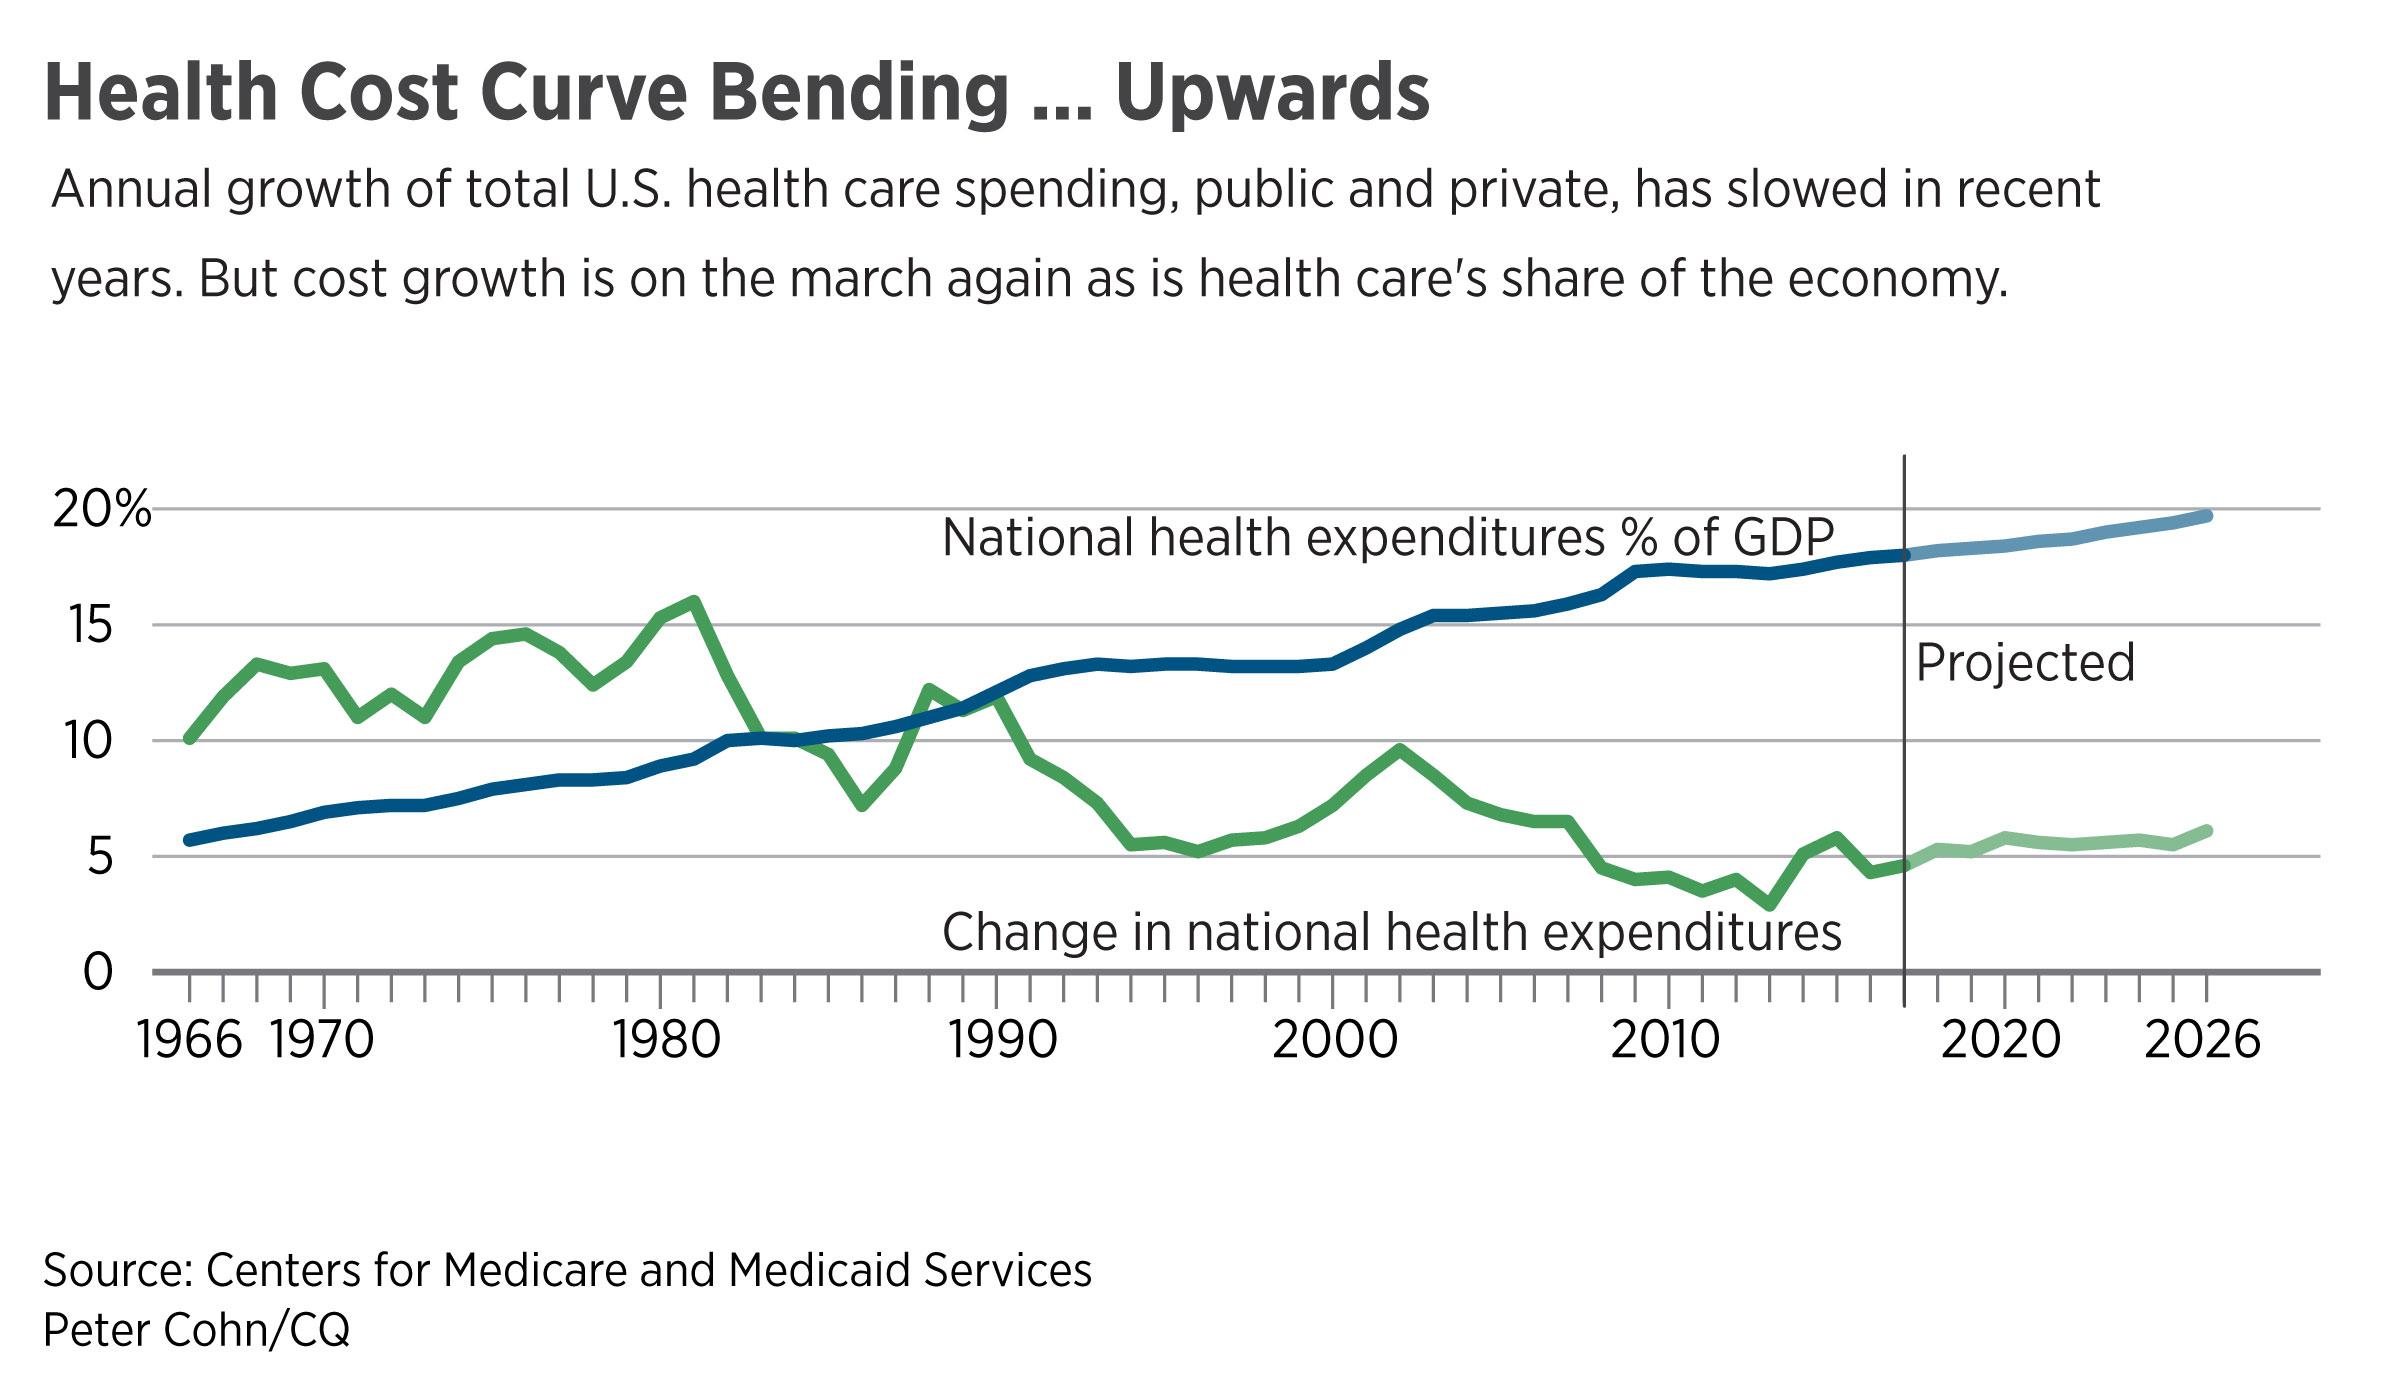 Health Cost Curve Bending ... Upwards